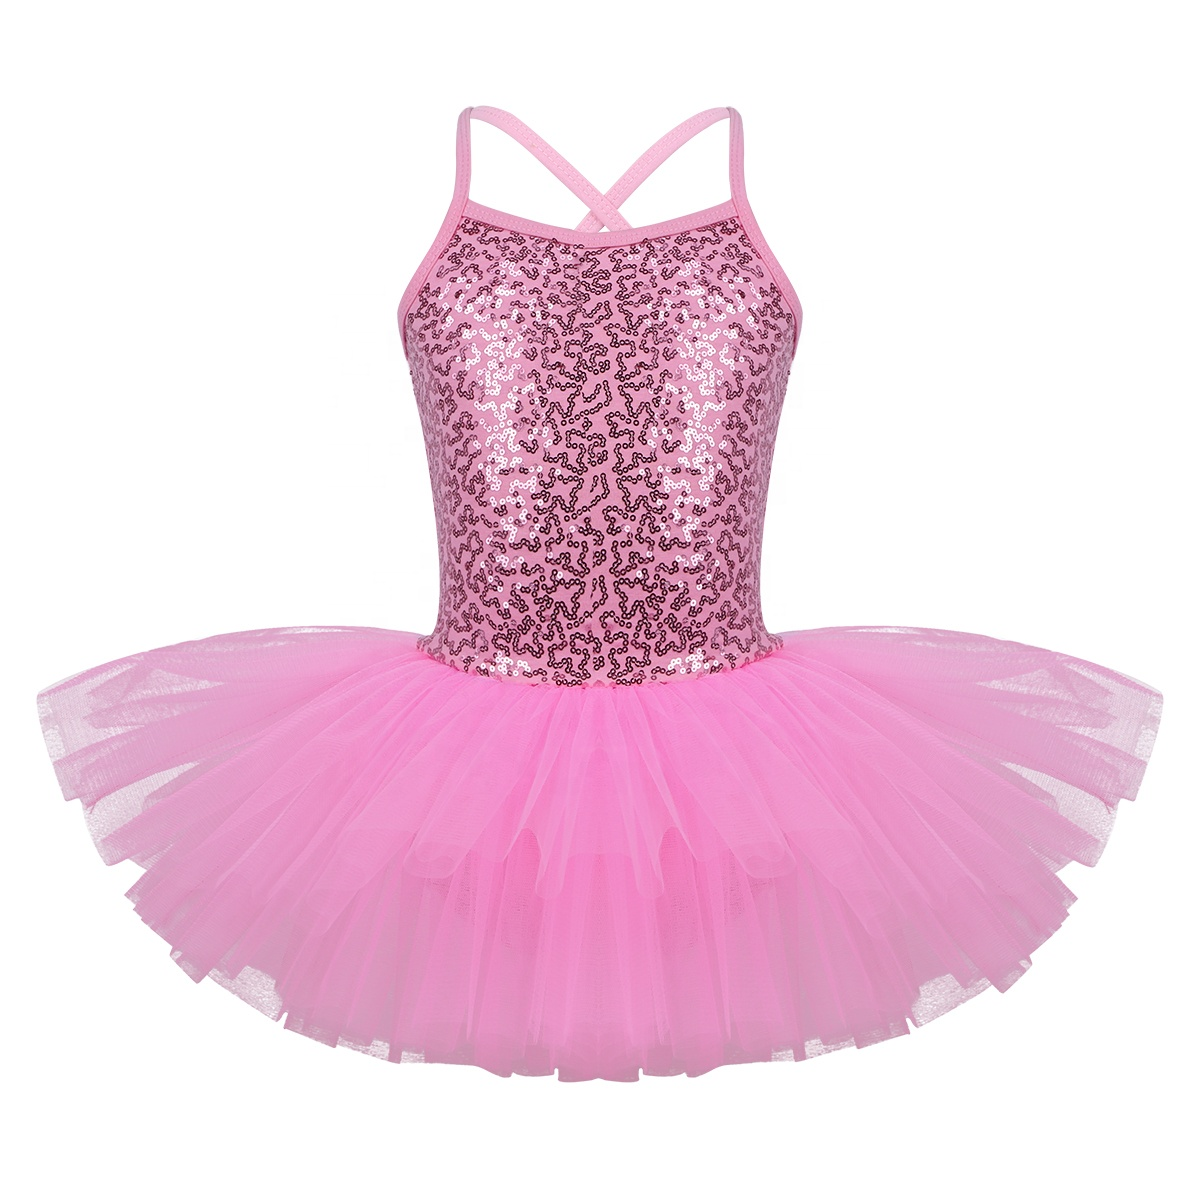 UK Kids Girls Sequined Ballet Dance Dress Gymnastics Leotard Ballerina Costume